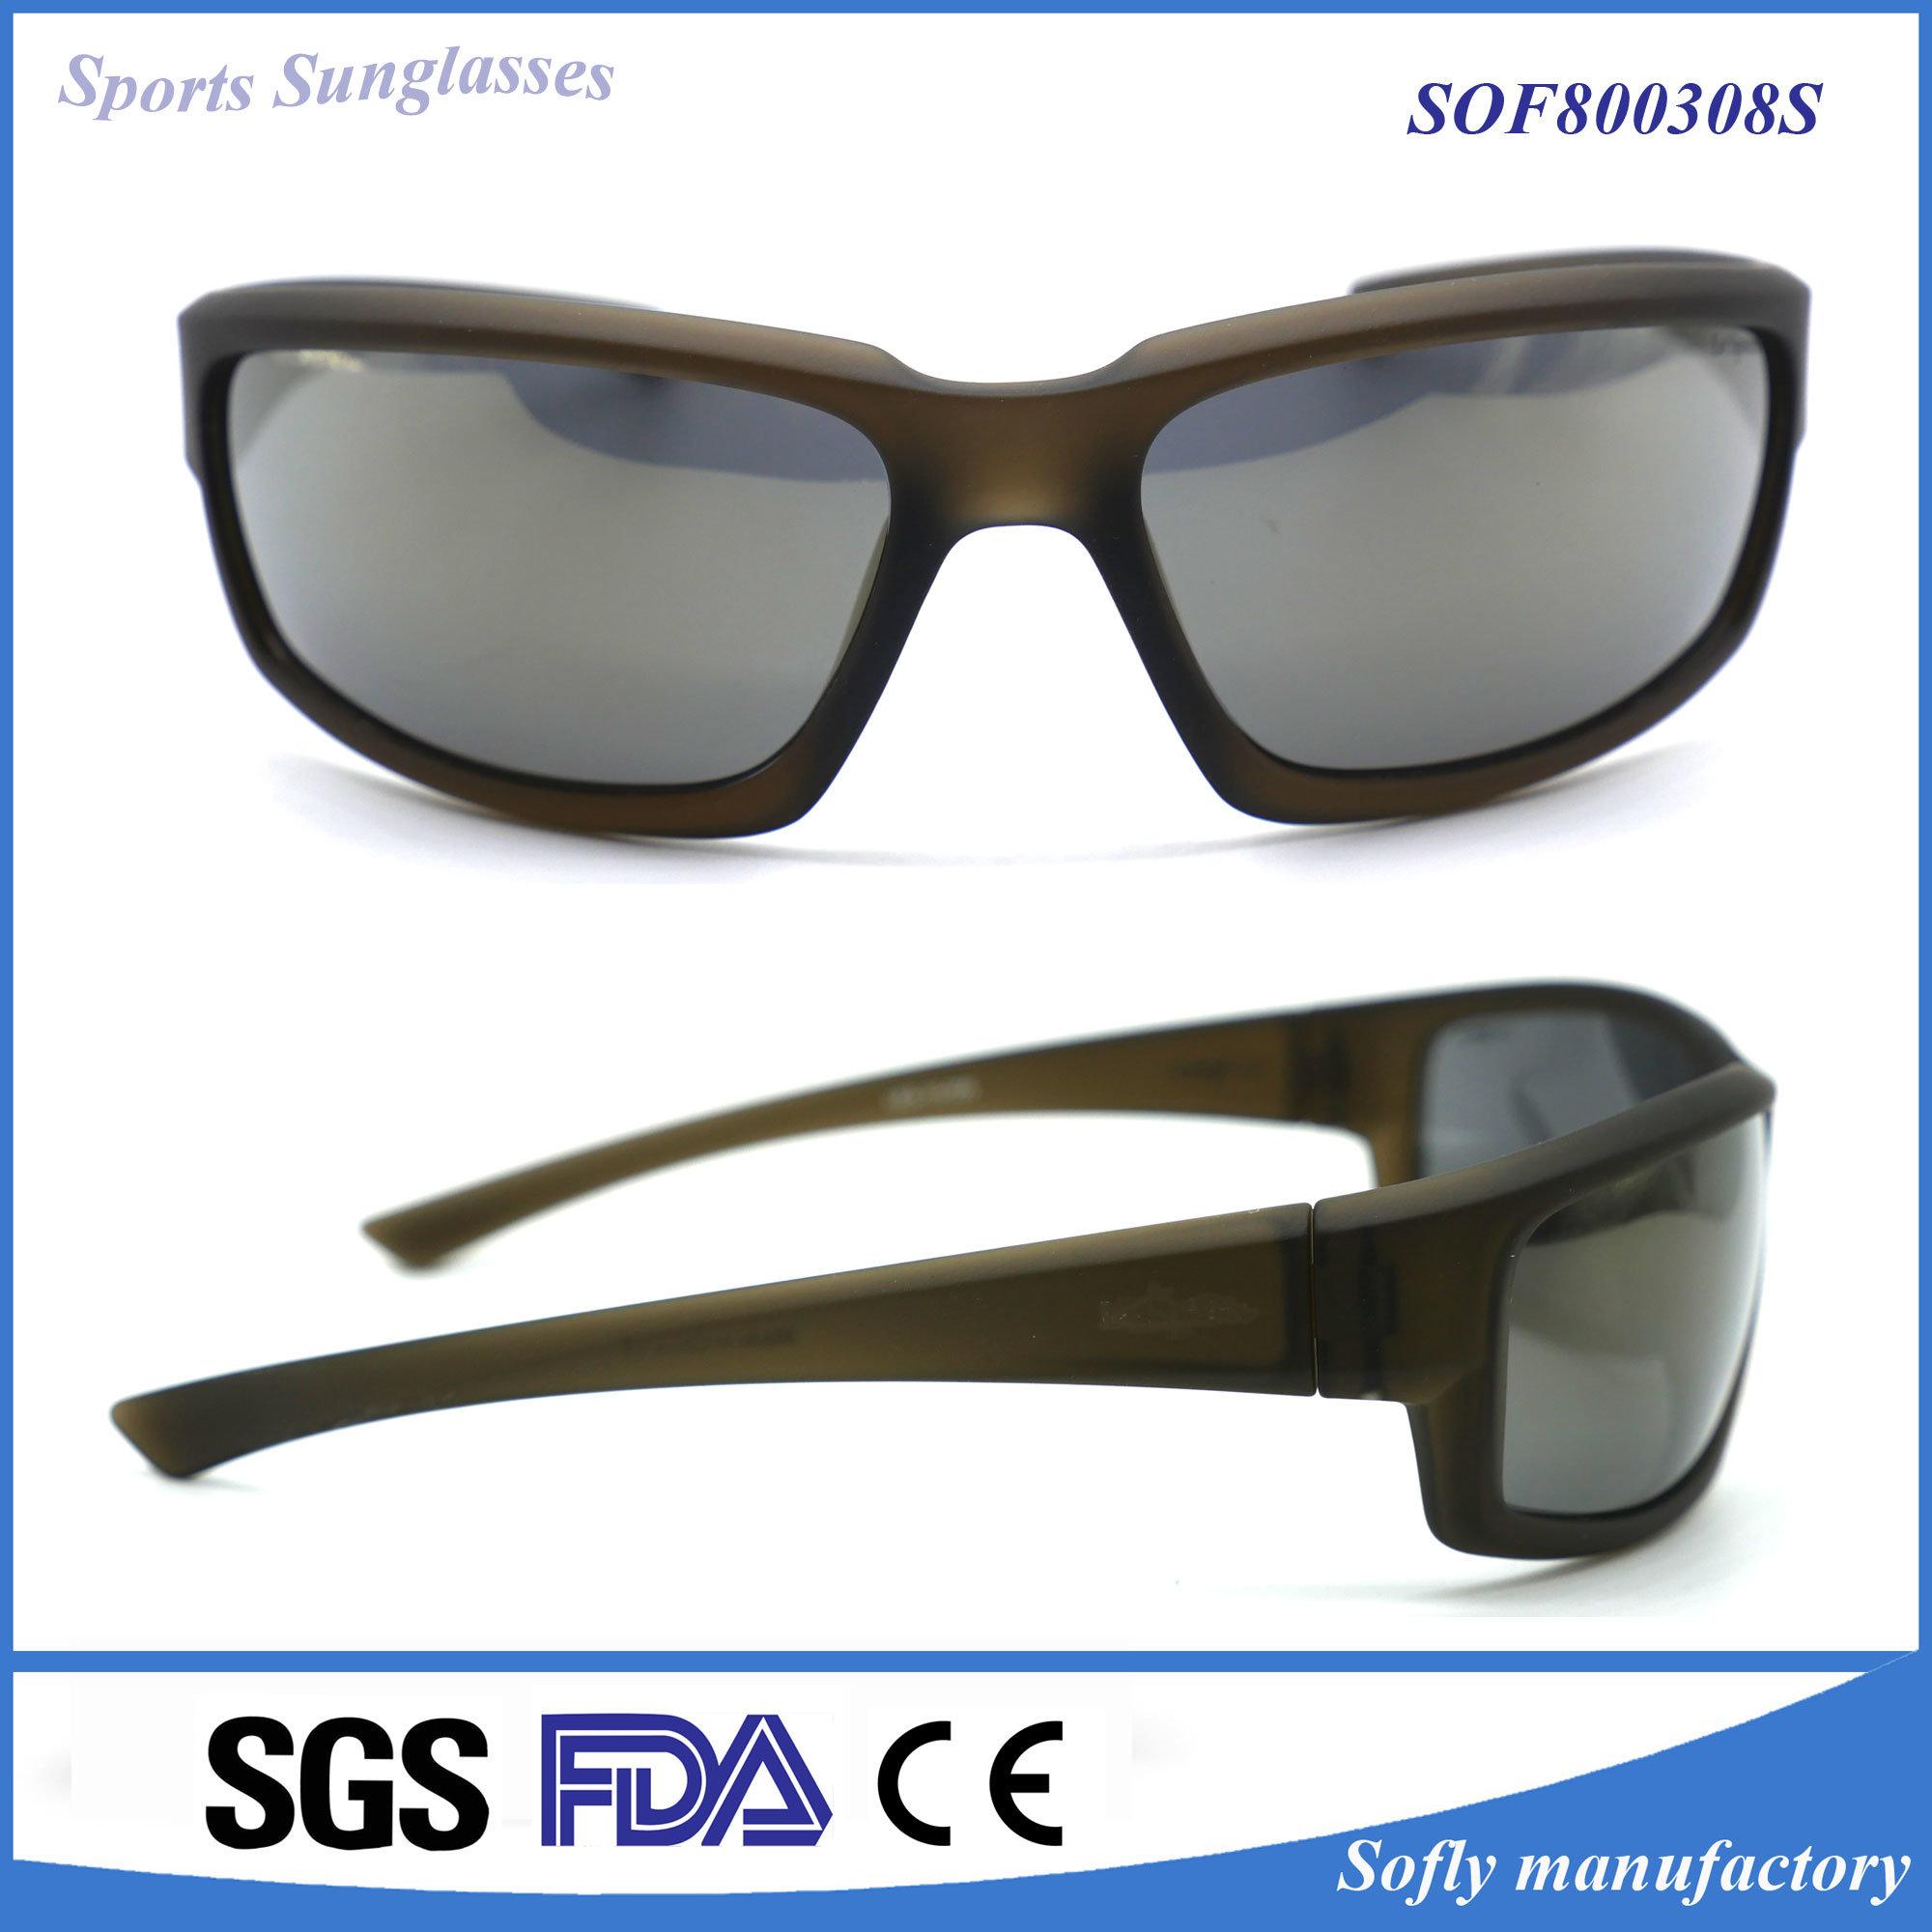 6c73eb2955d7 China Discount Designer Fashion Protective Men′s Mountain Sport Sunwear  Sunglasses - China Sunglasses